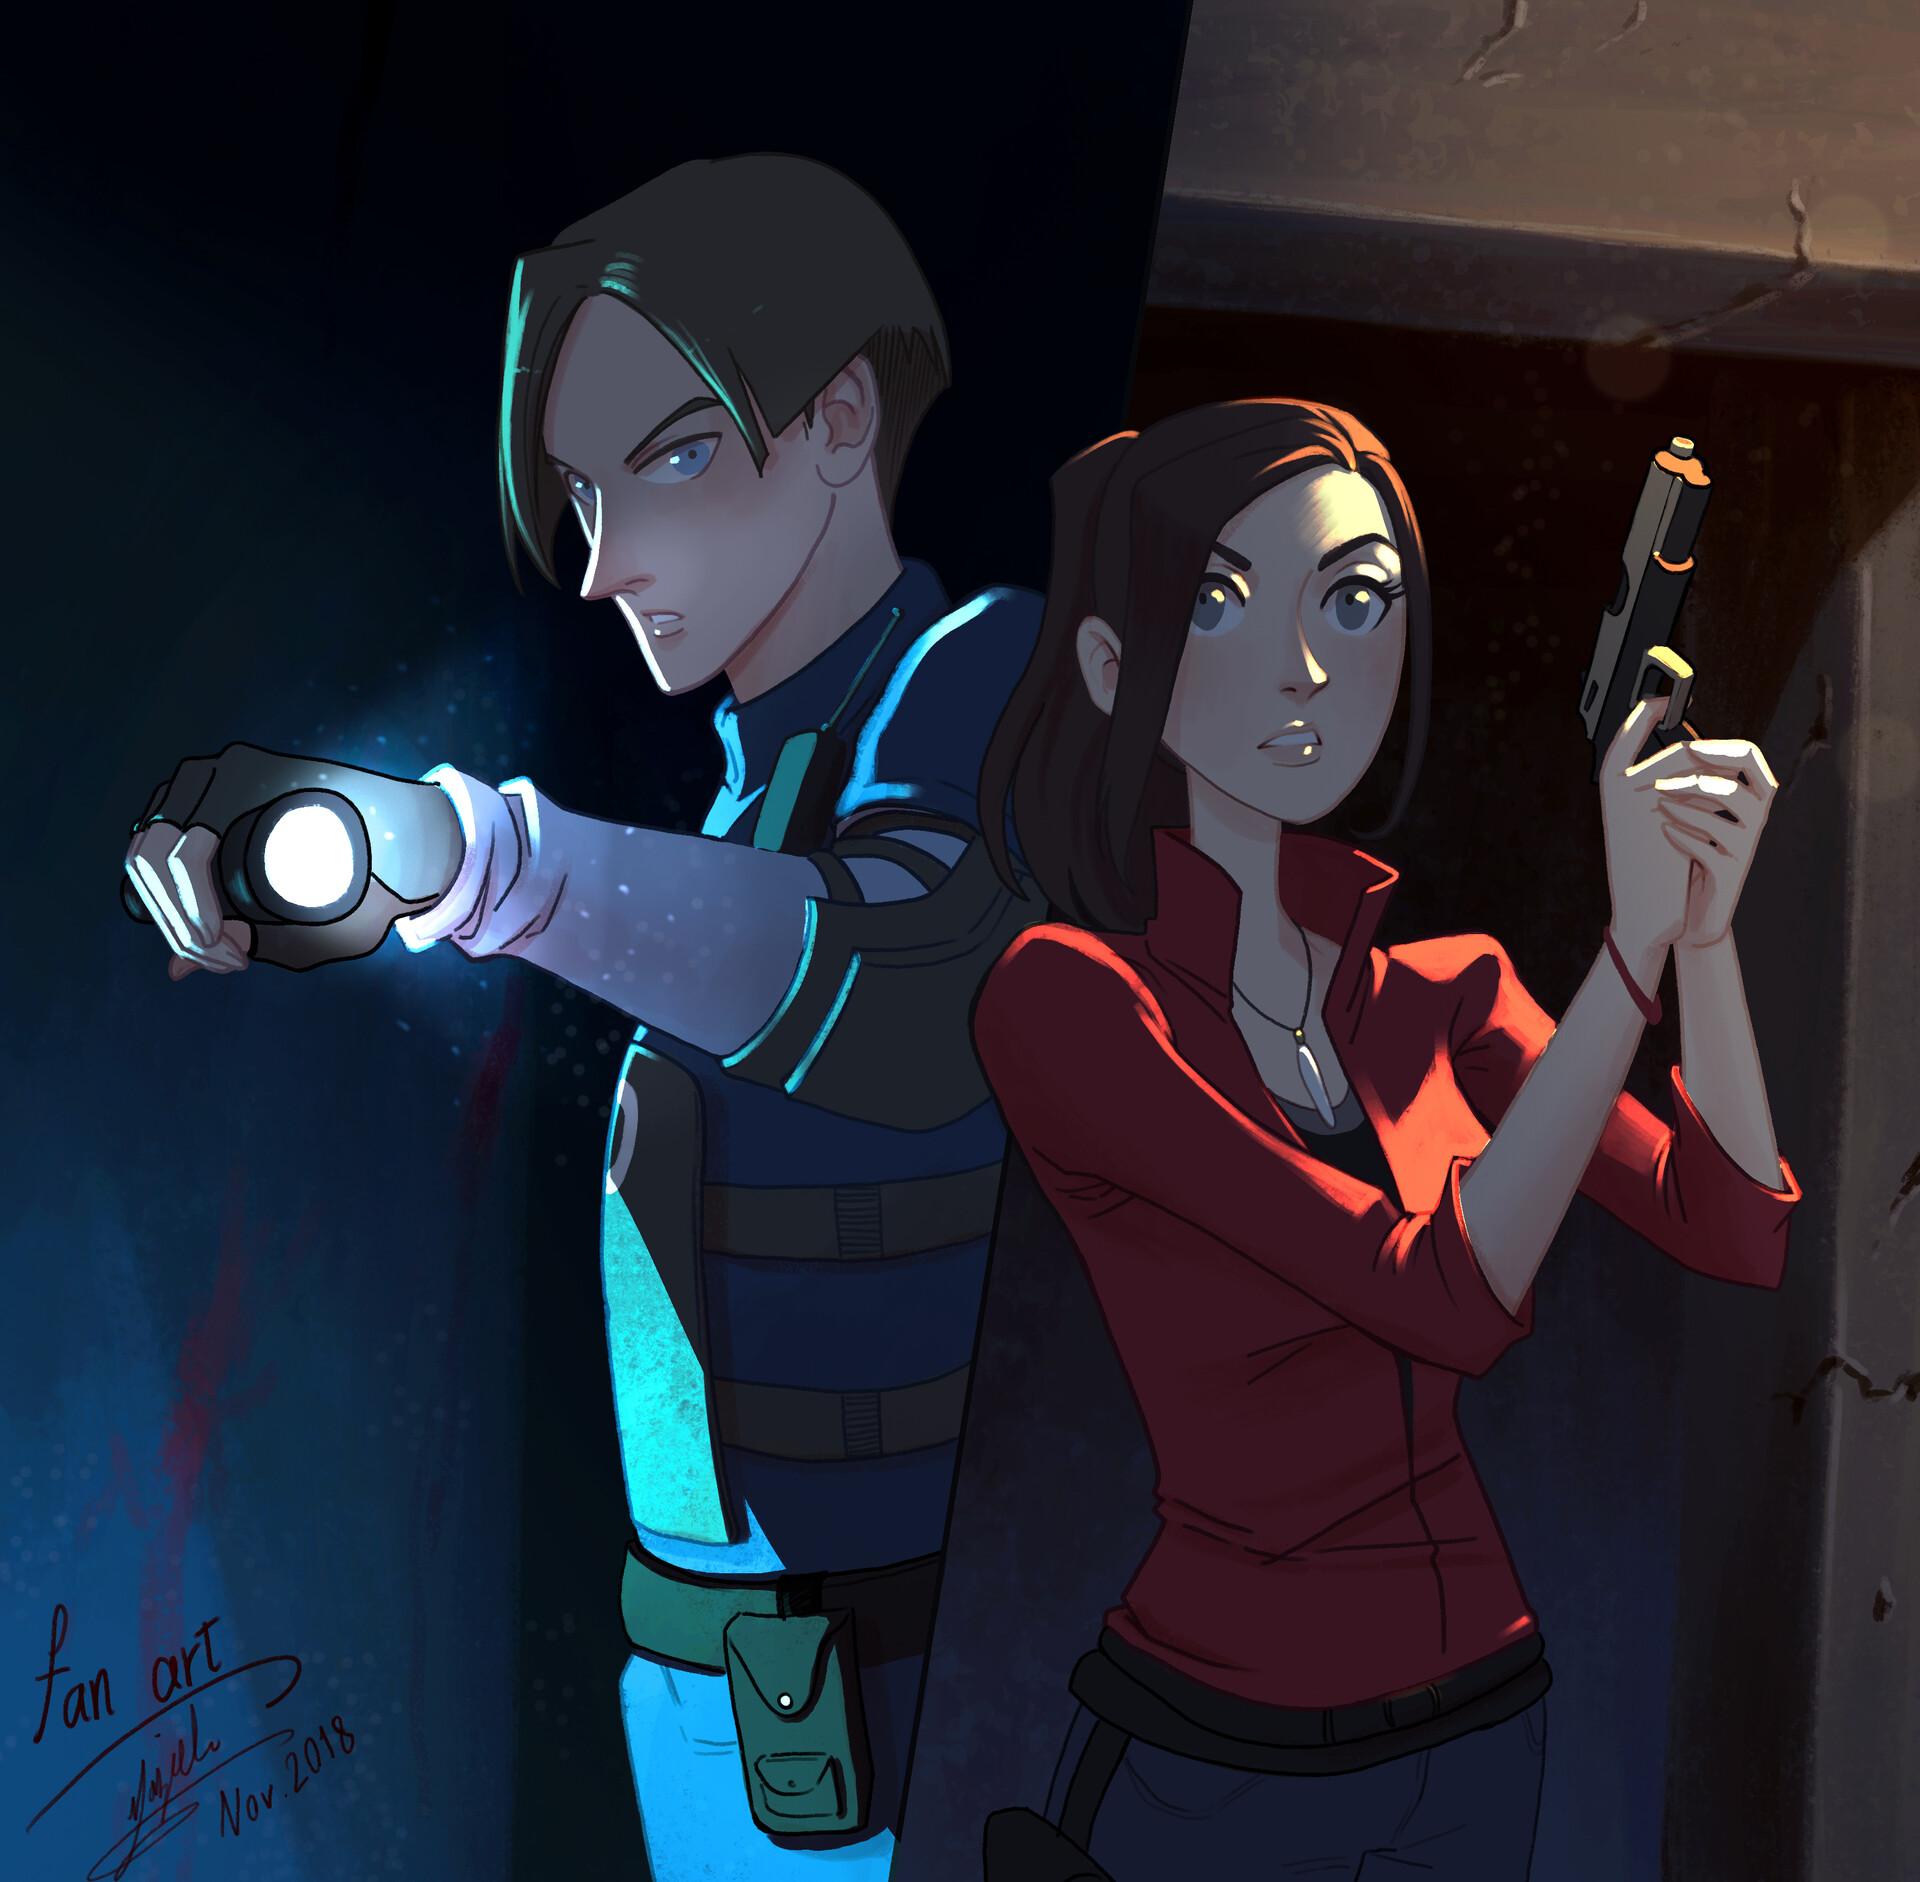 Artstation Resident Evil 2 Remake Fan Art Marzieh Meisami Azad